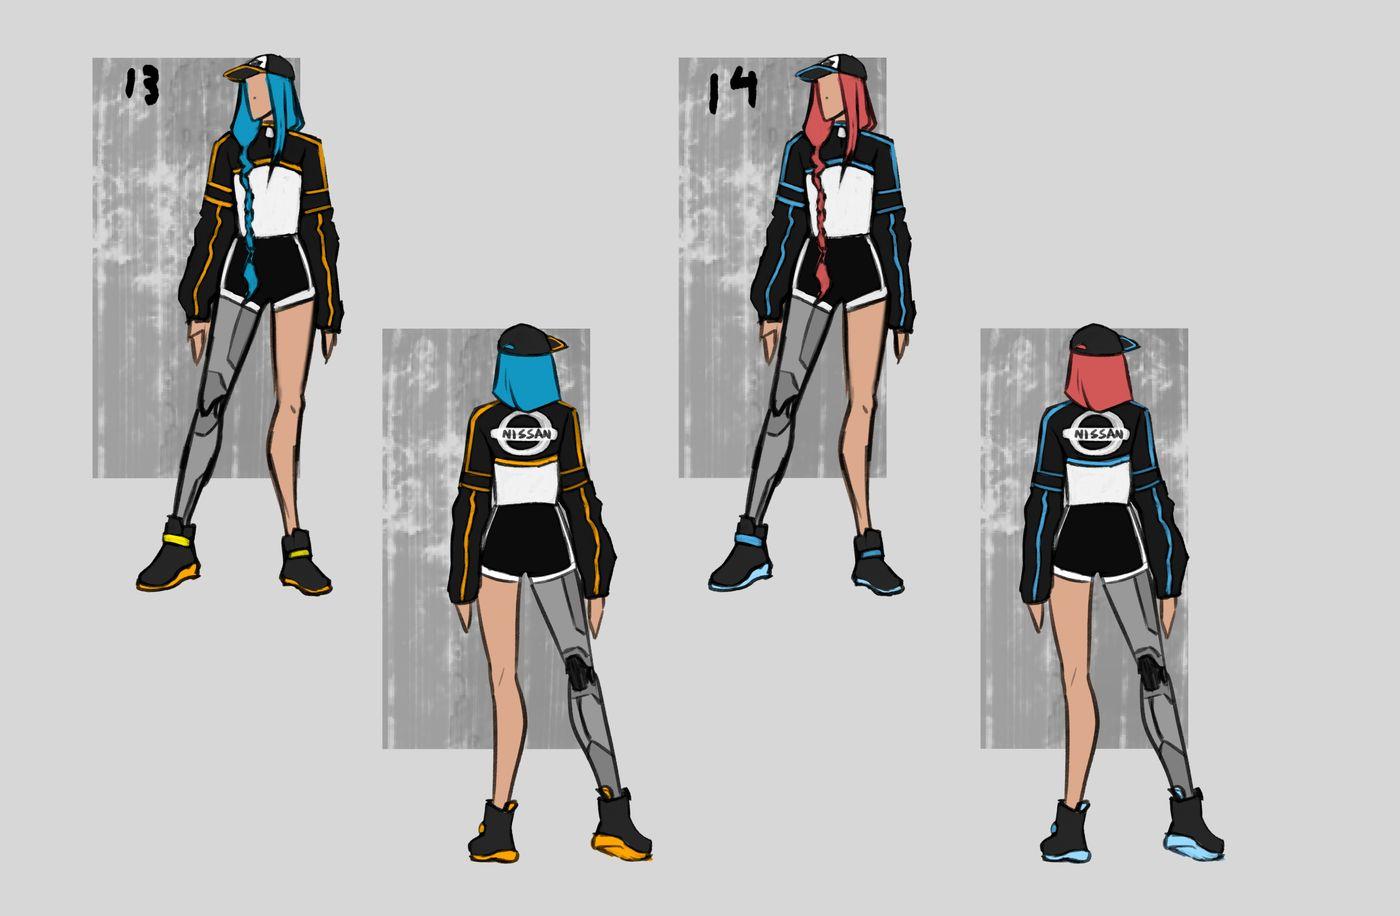 Steer Jasmine %20 Scme3420 Rookies %20 Character Design Colour Passes07 Jasminesteer